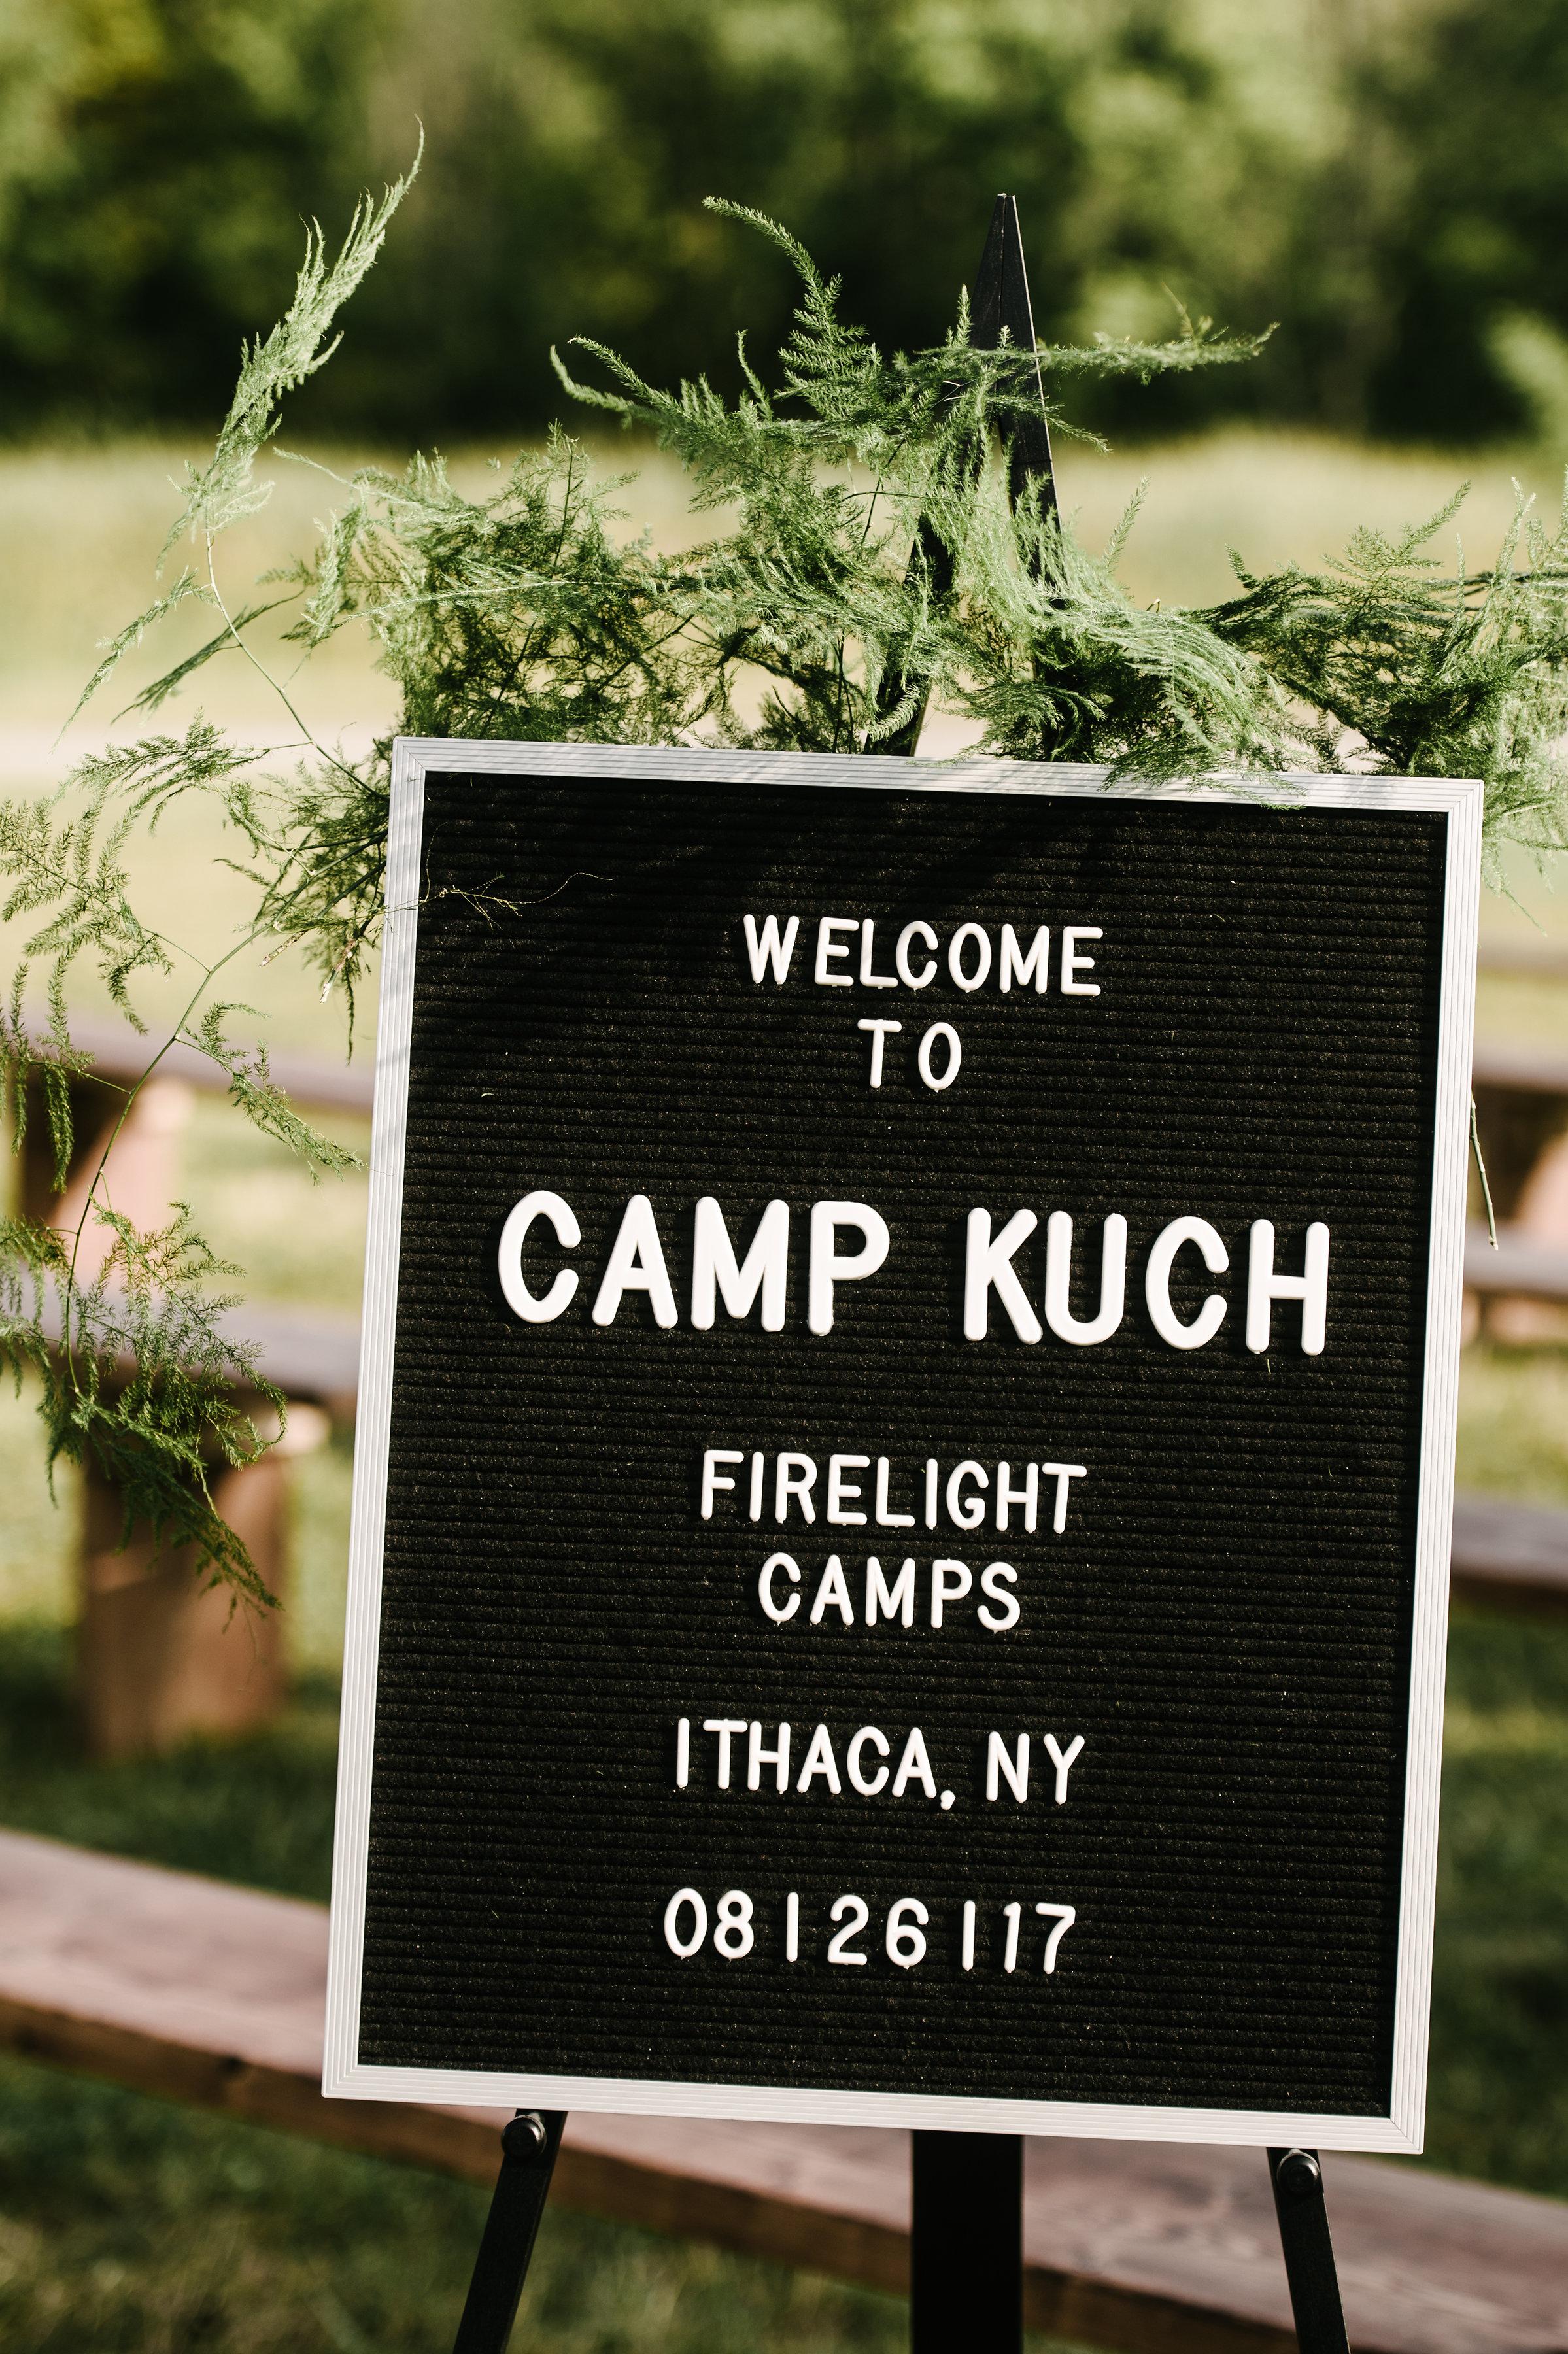 campkuch-3945.jpg